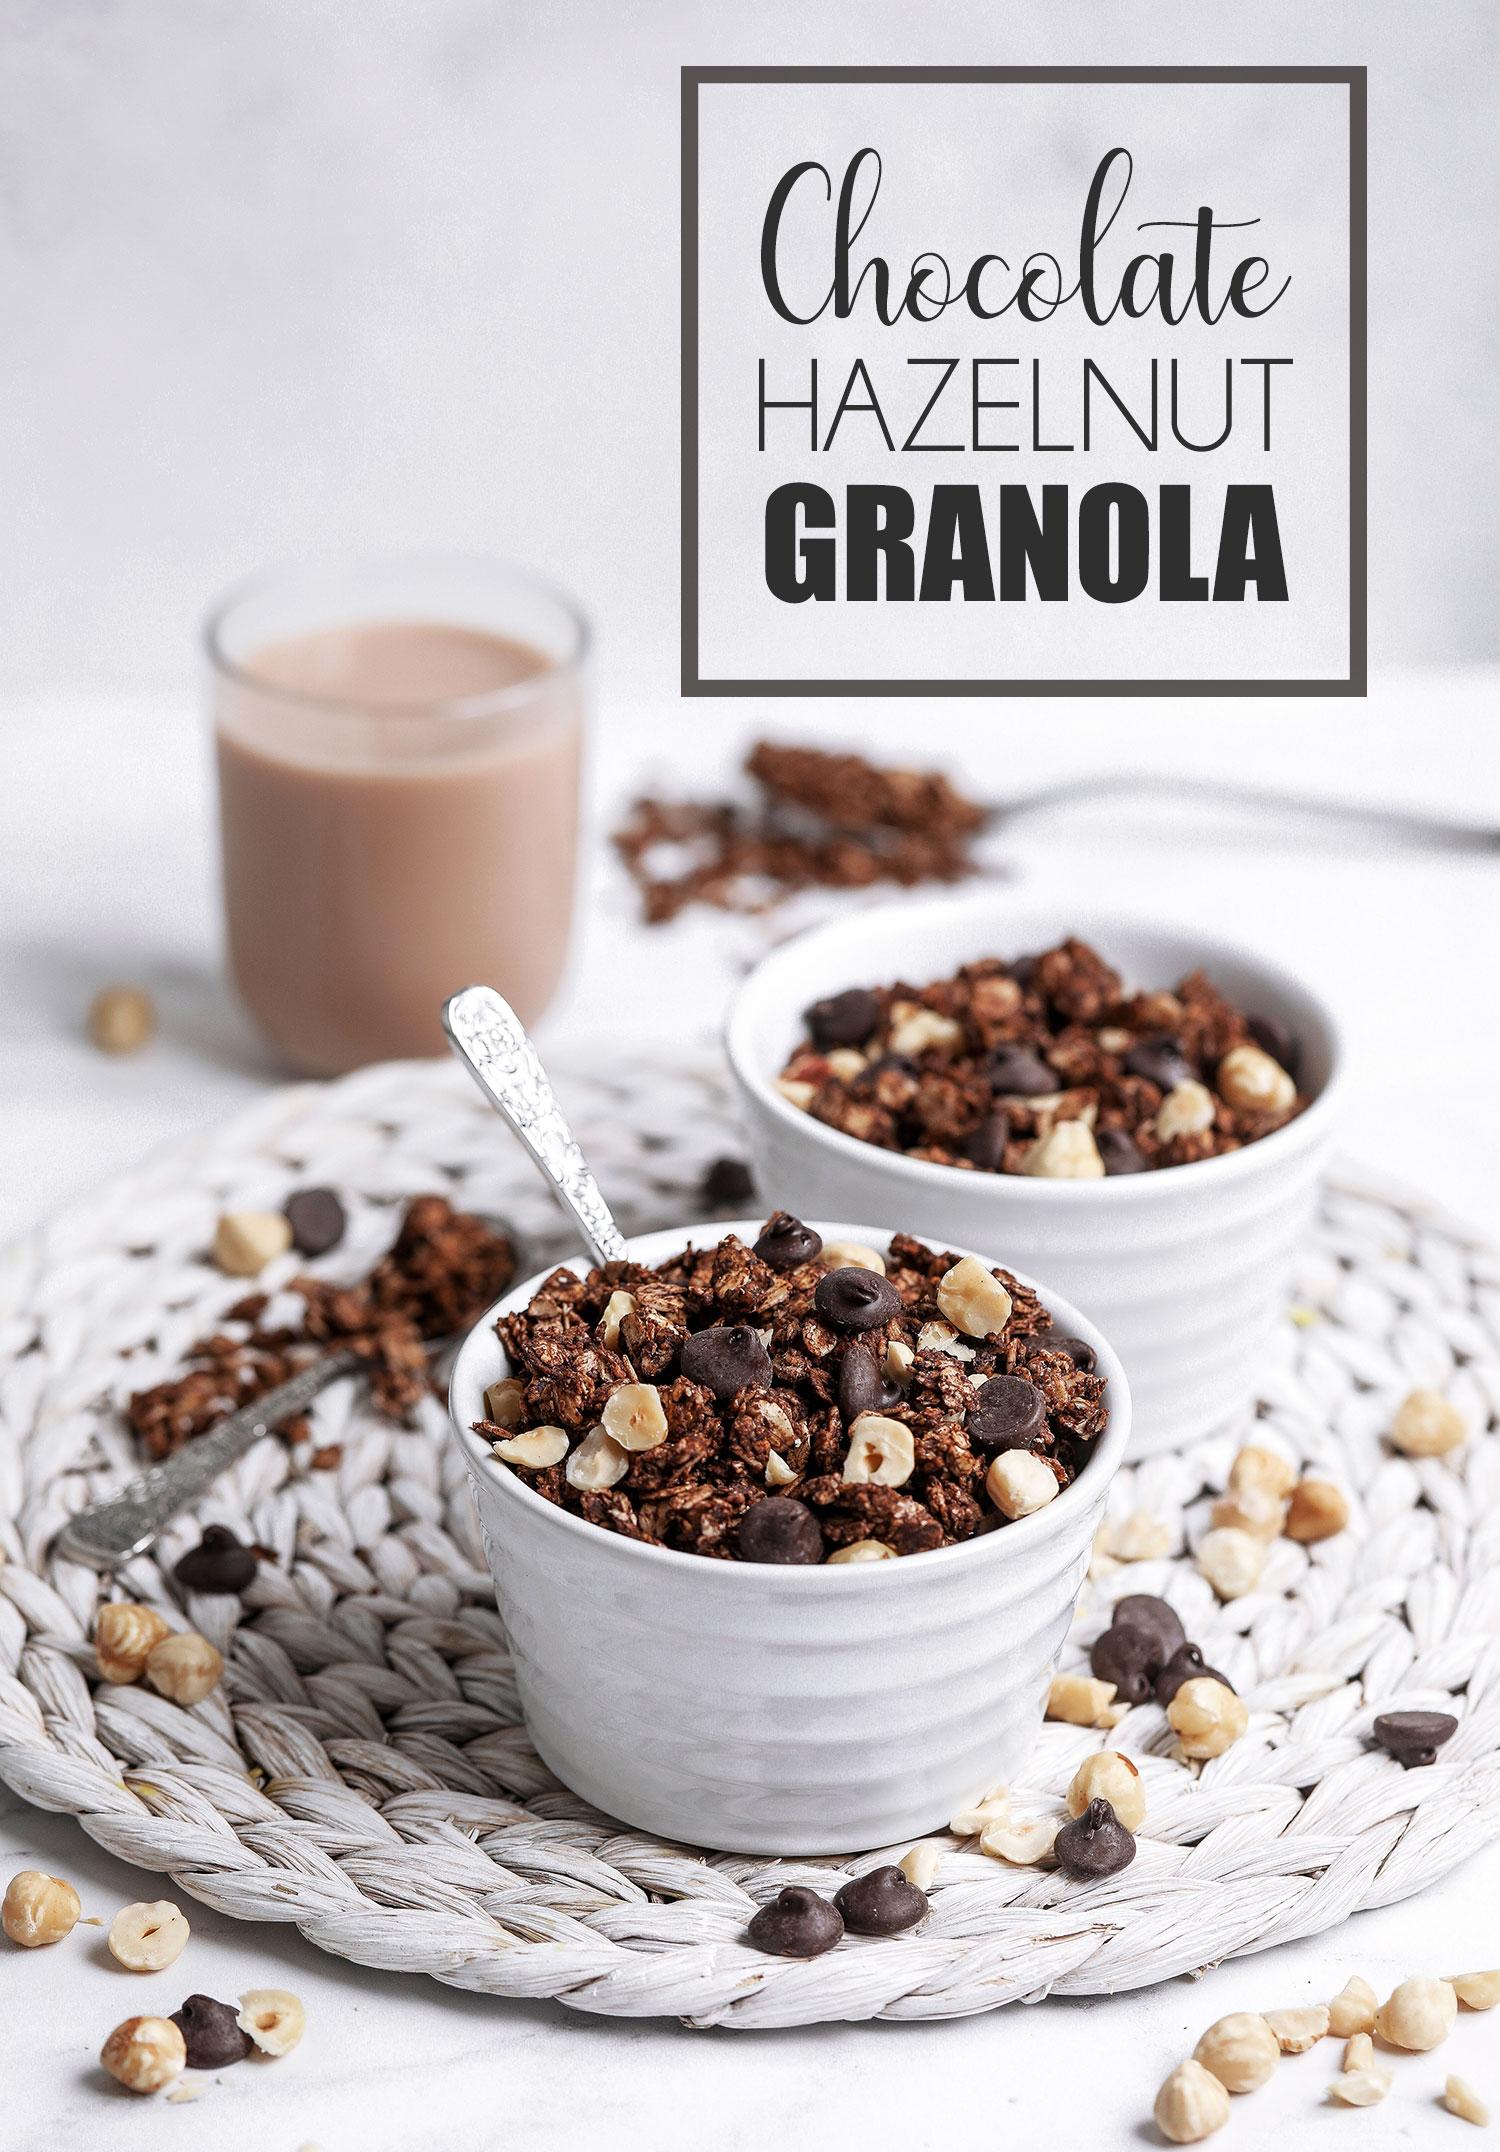 Vegan & Gluten-free Chocolate Hazelnut Granola